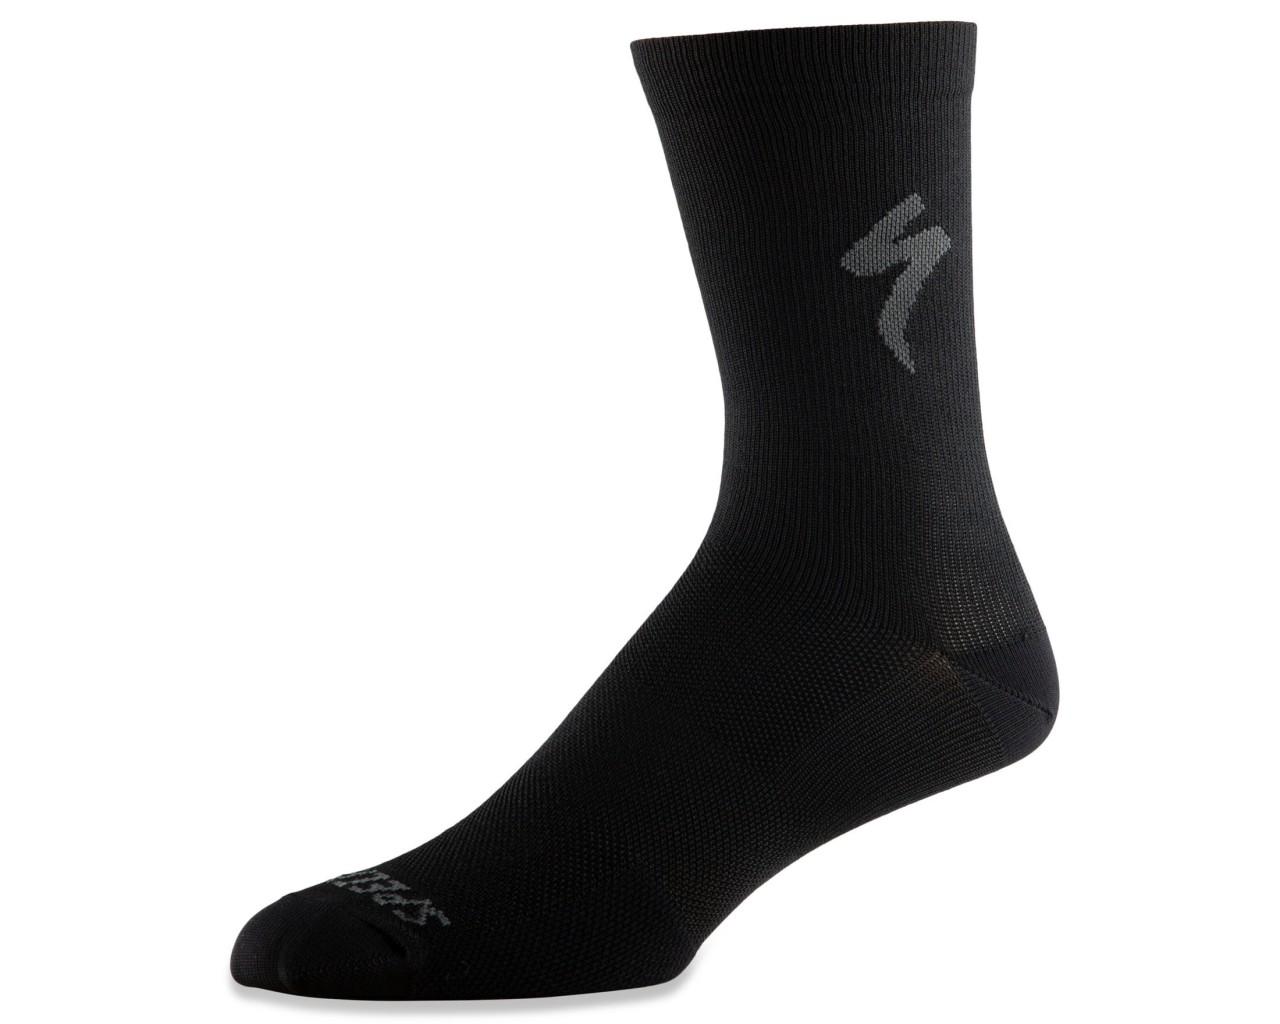 Specialized Soft Air Road Tall Socks   black